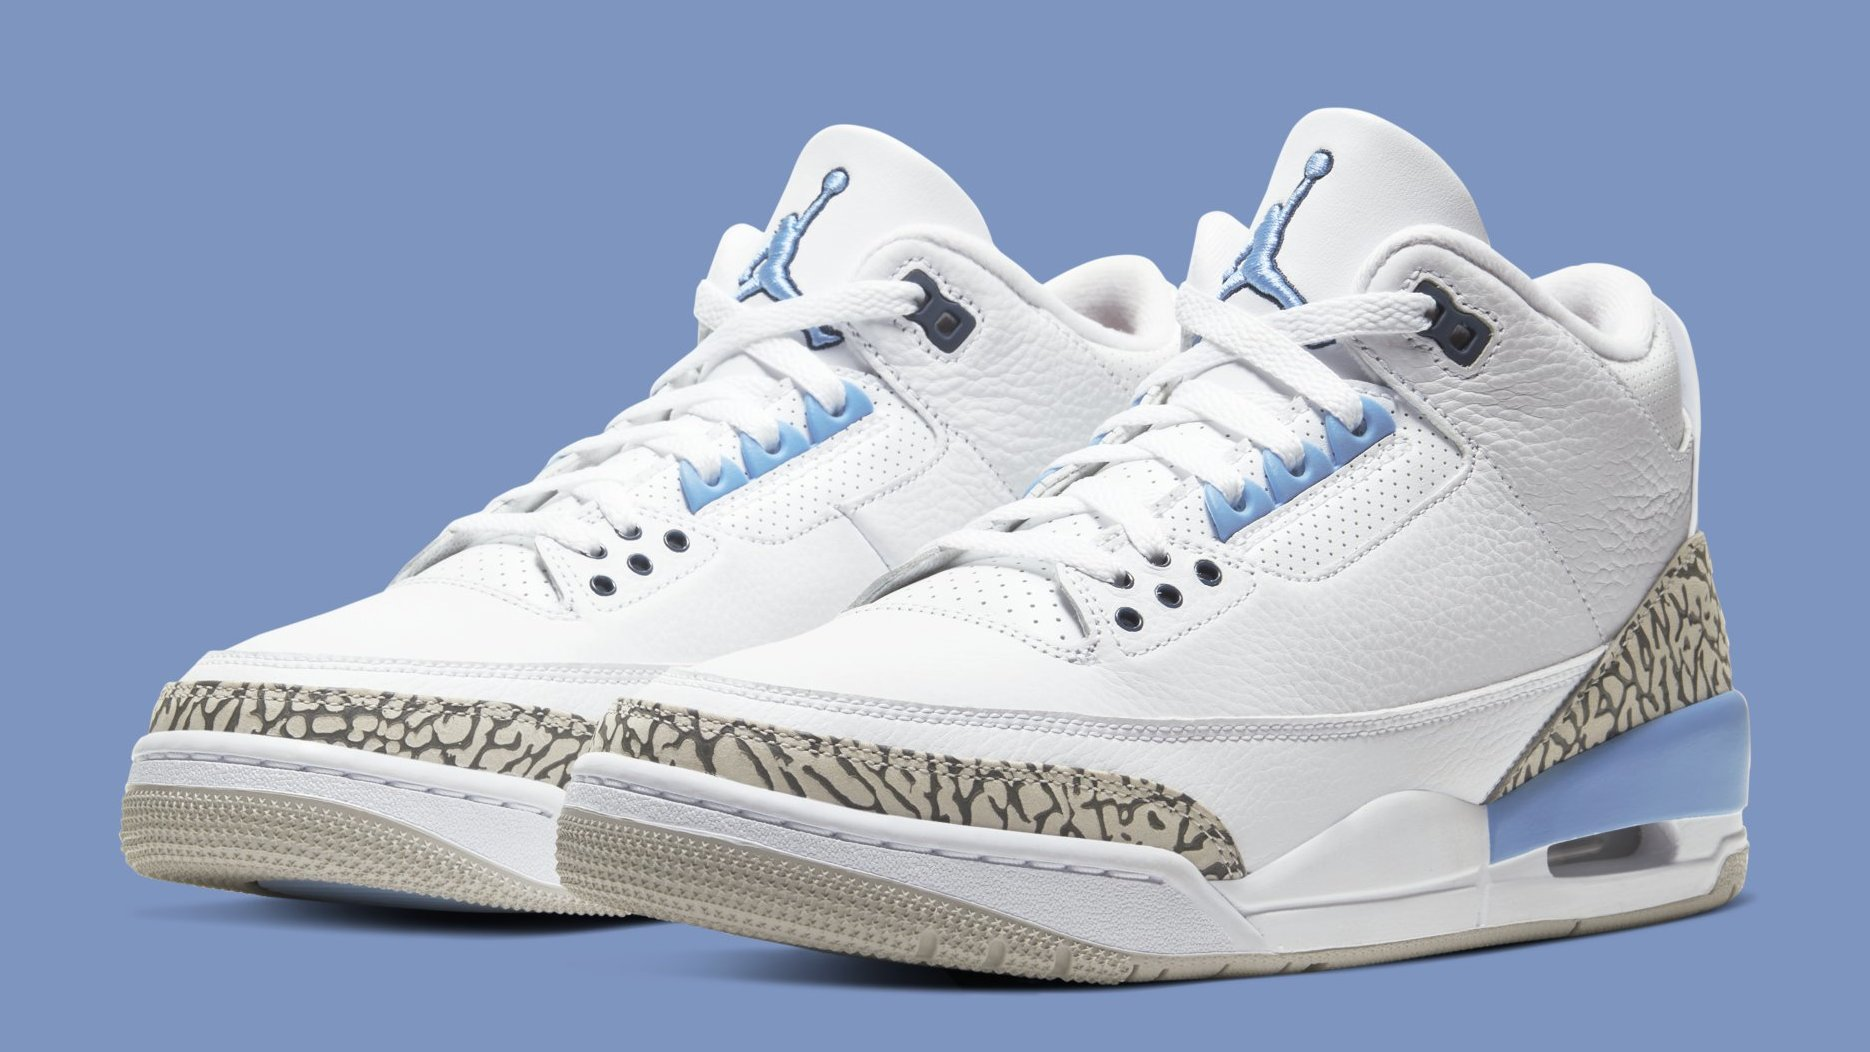 Air Jordan 3 'UNC' Release Date CT8532-104 | Sole Collector